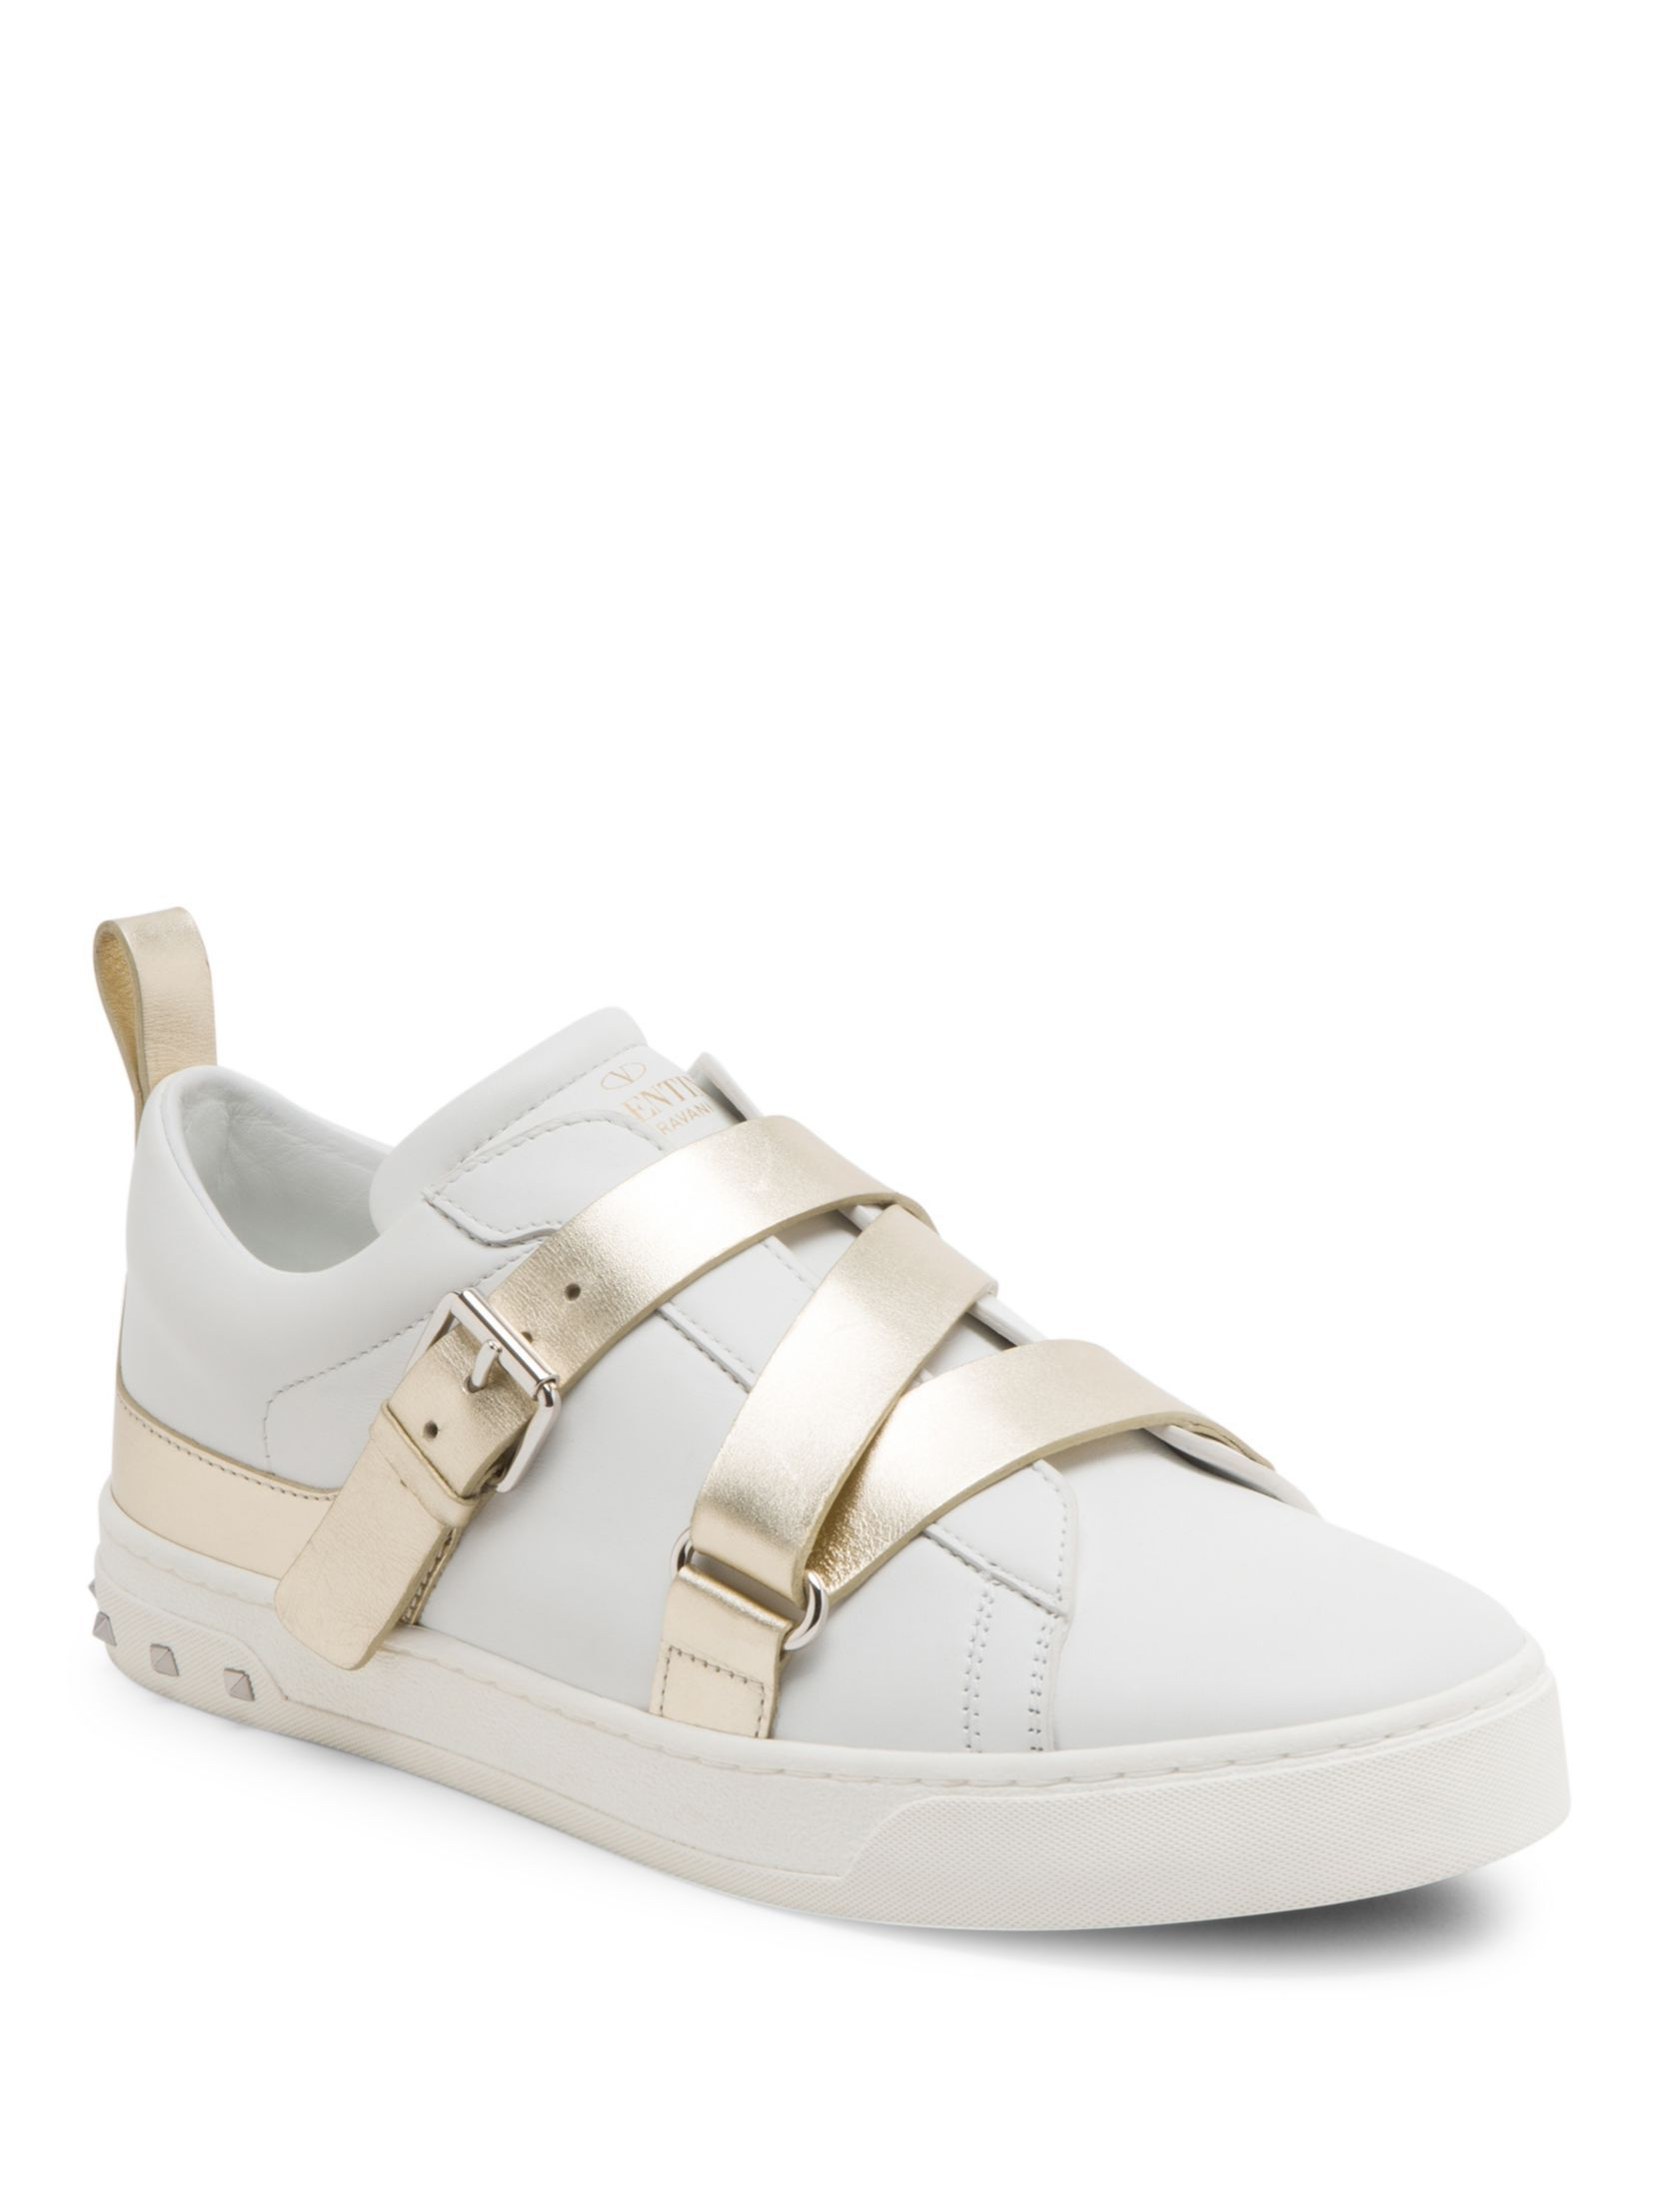 Valentino V-Punk Leather Sneakers | Valentino sneakers, Valentino